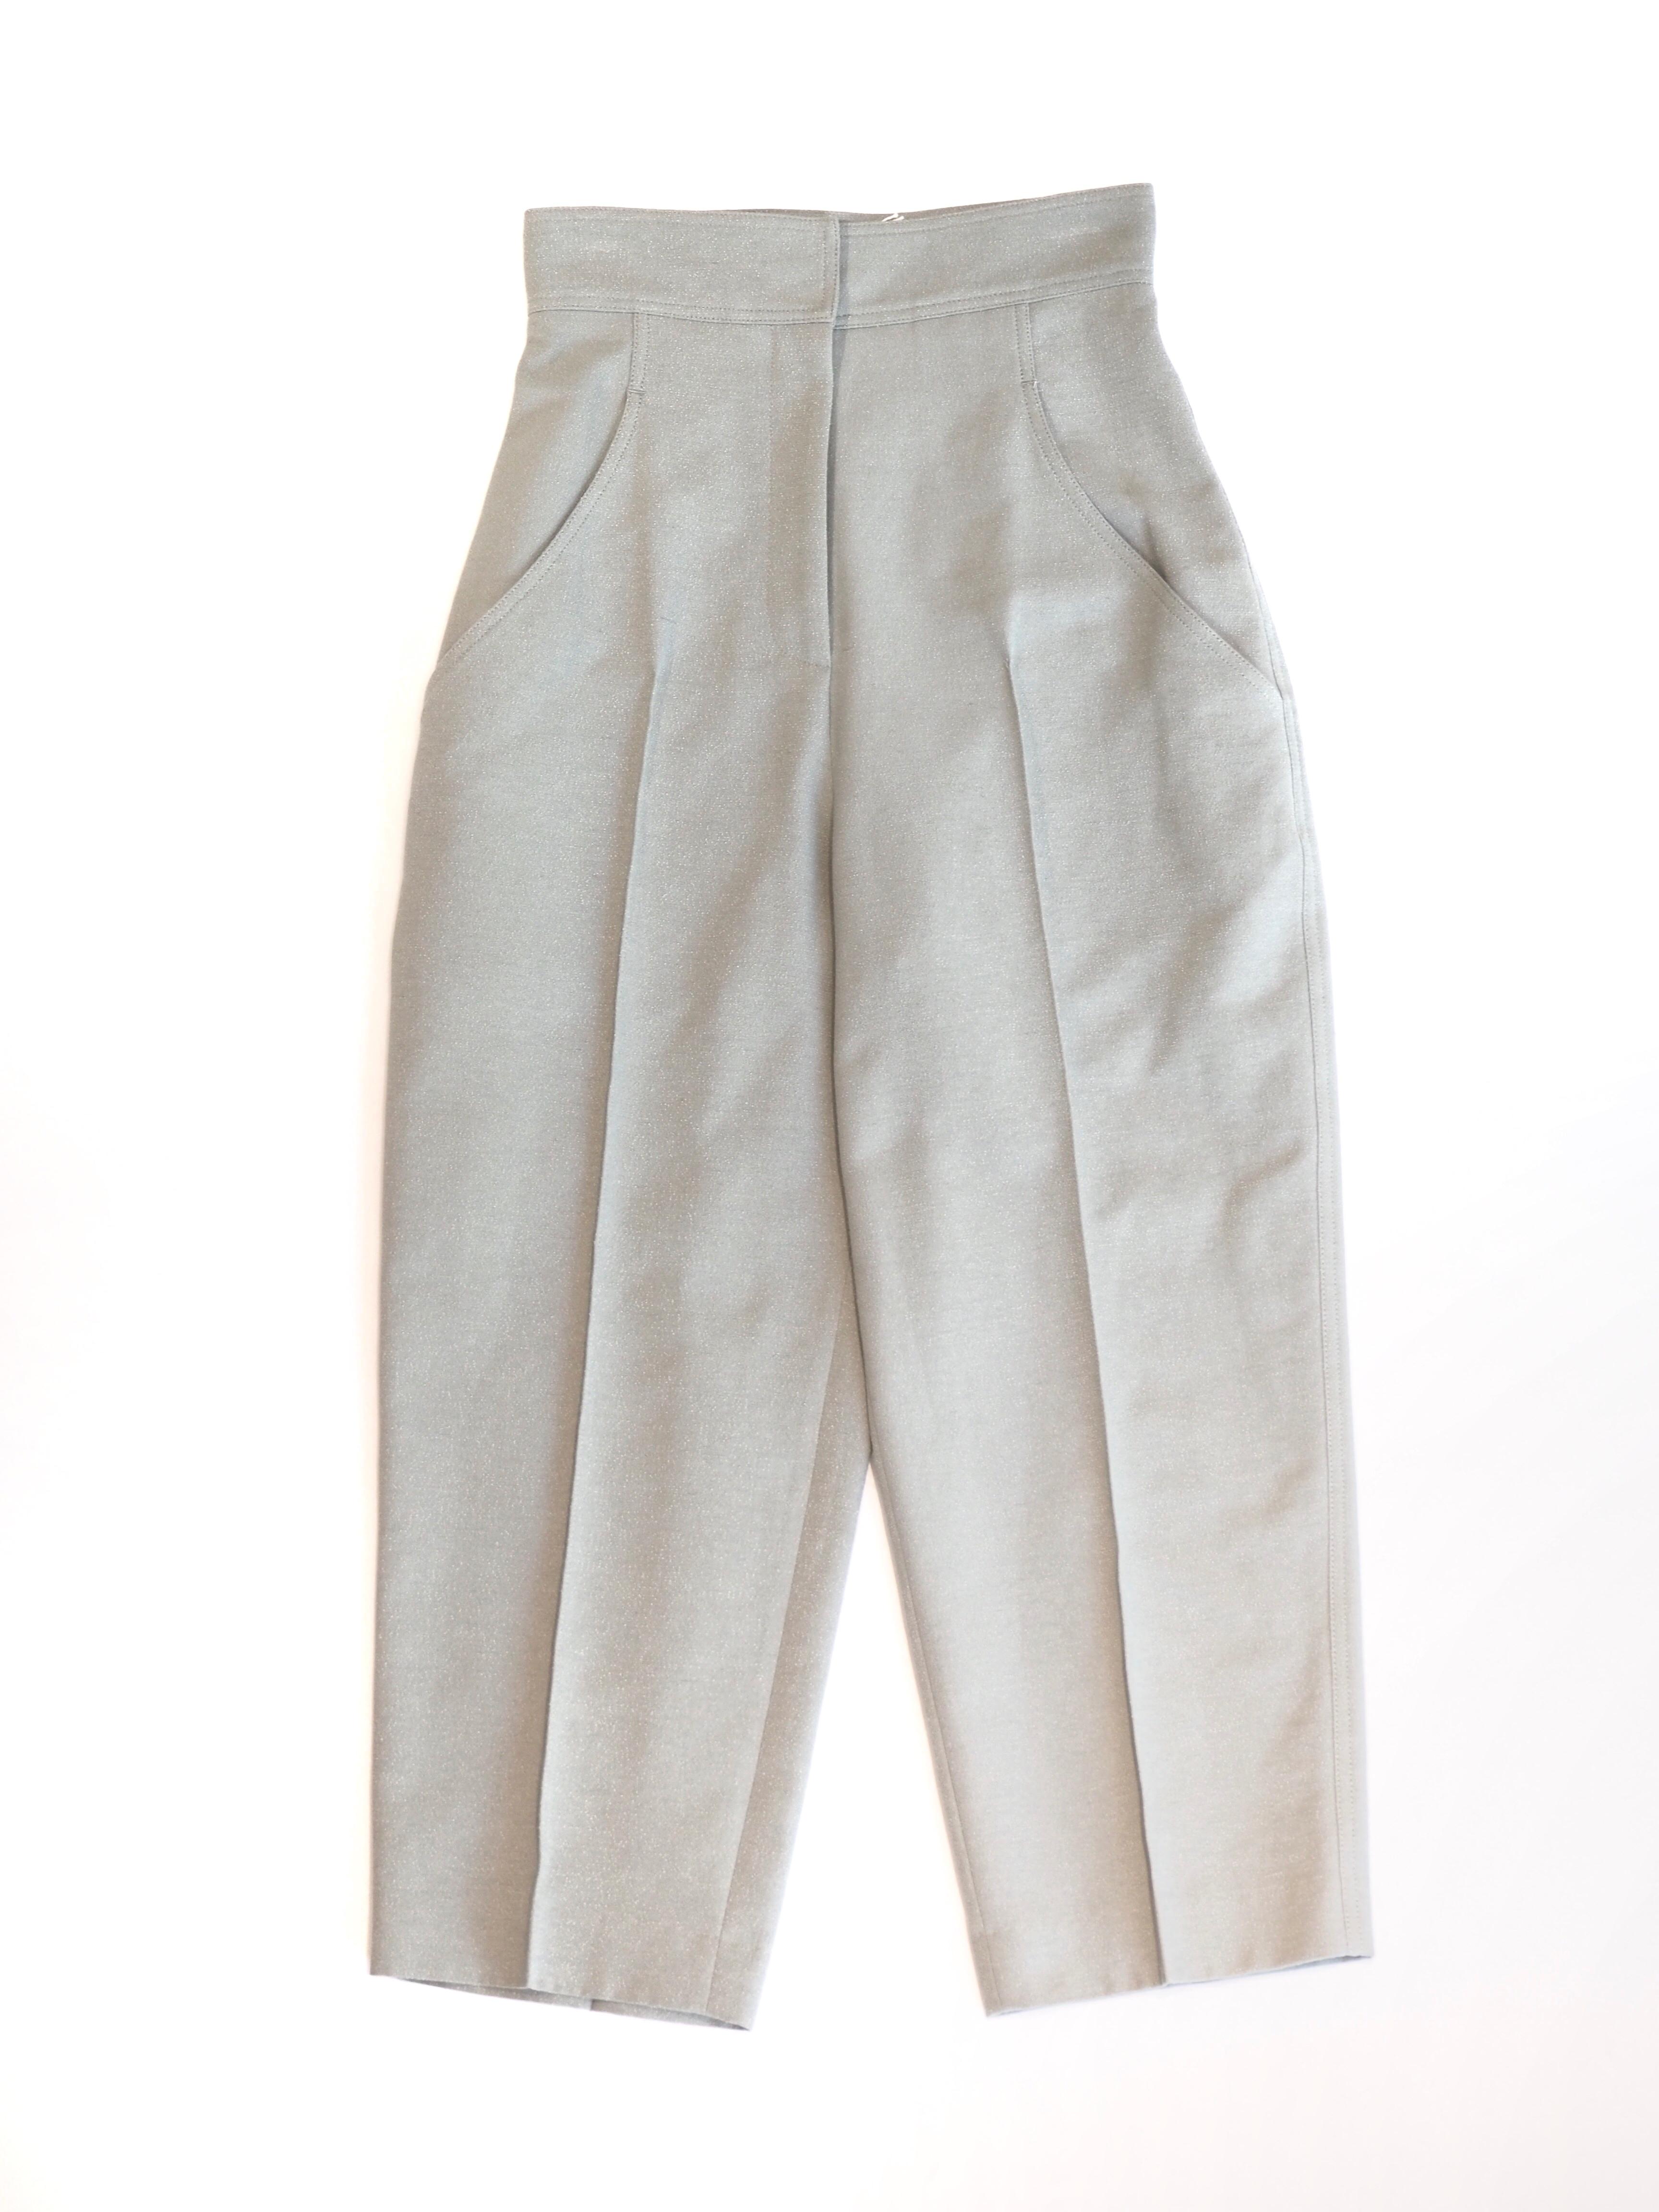 【ELIN】BOUCLE HIGH WAIST PANTS